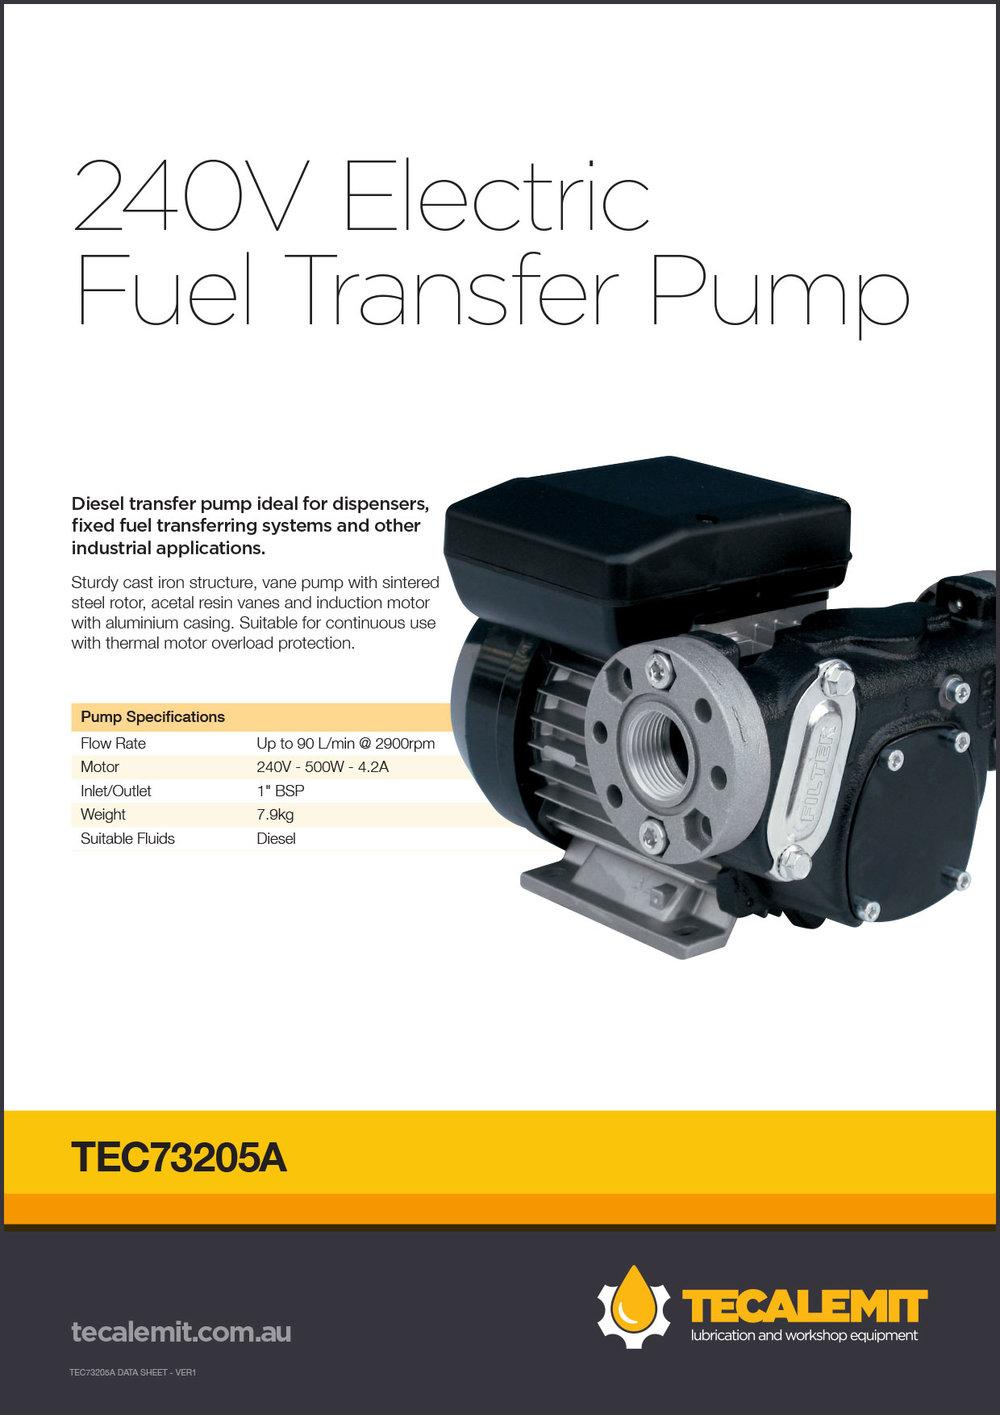 TEC73205A Product Info